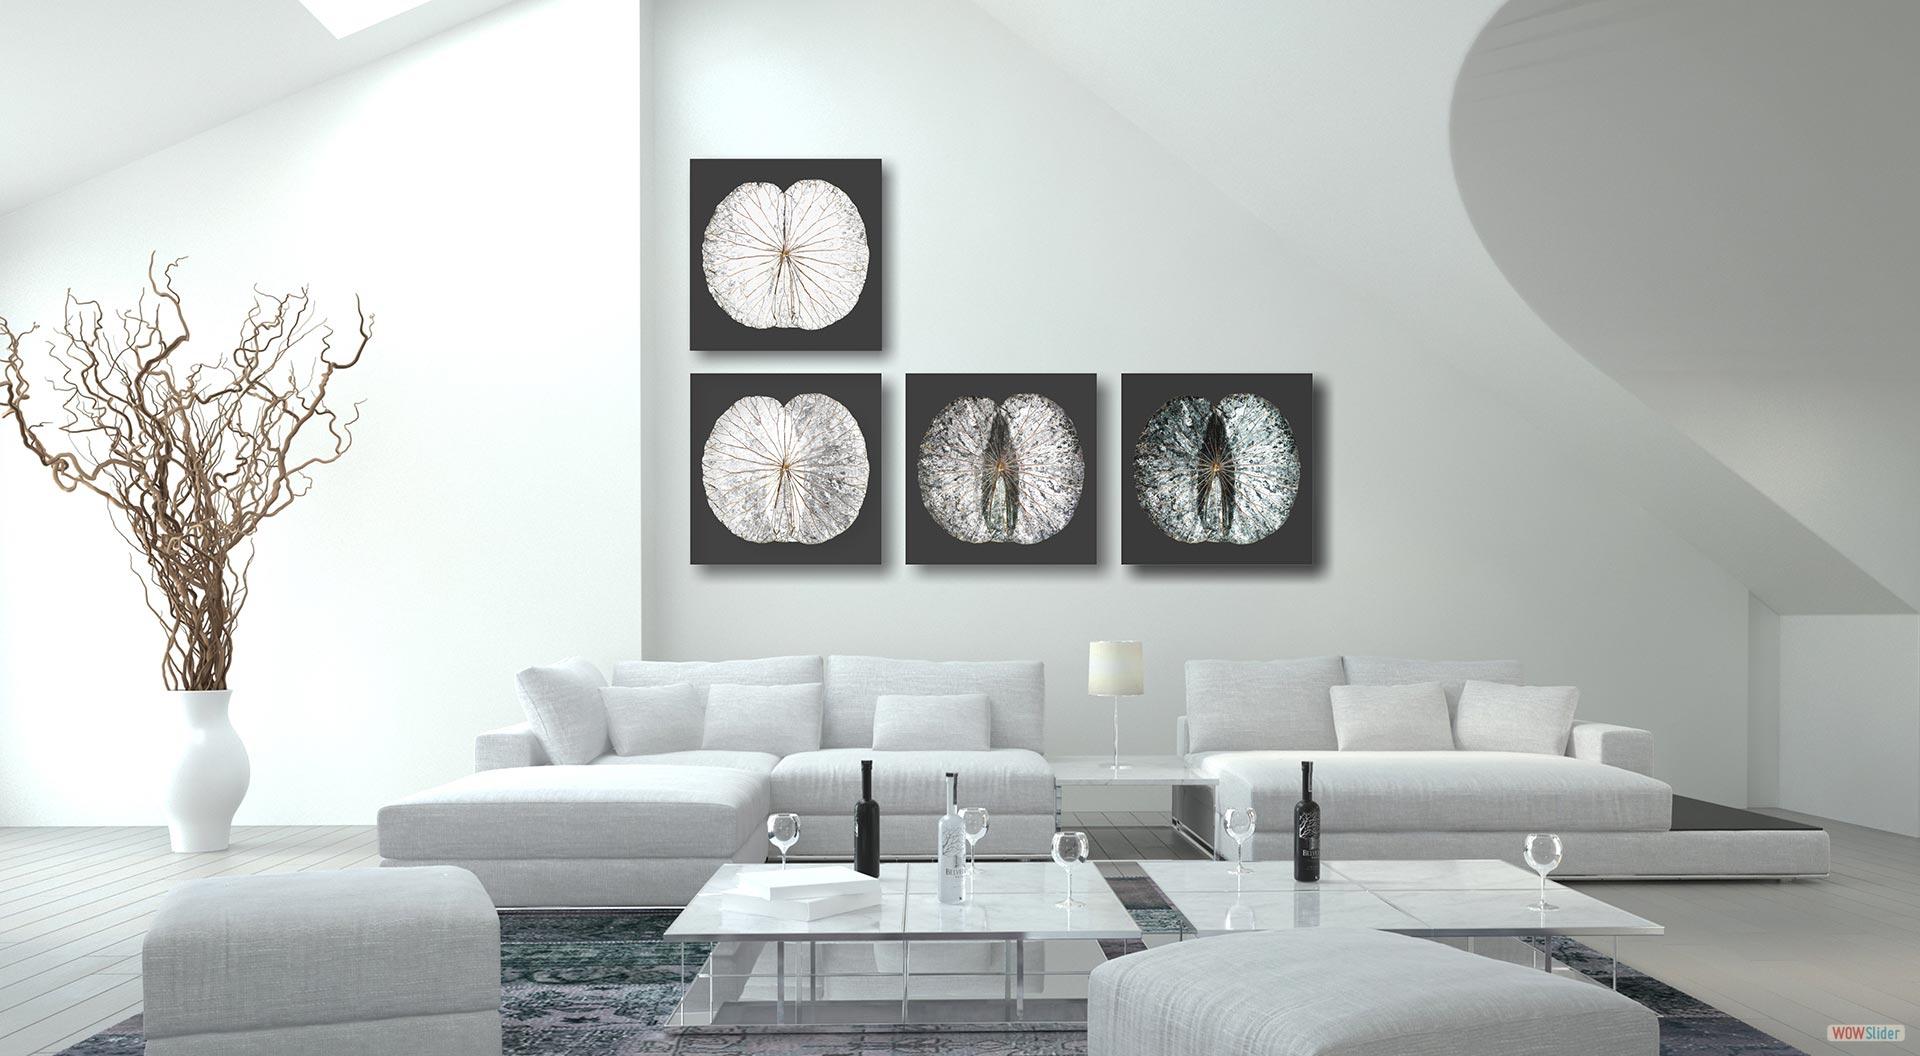 wandbilder von shermans lotus wall art bilder aus lotusbl ttern. Black Bedroom Furniture Sets. Home Design Ideas